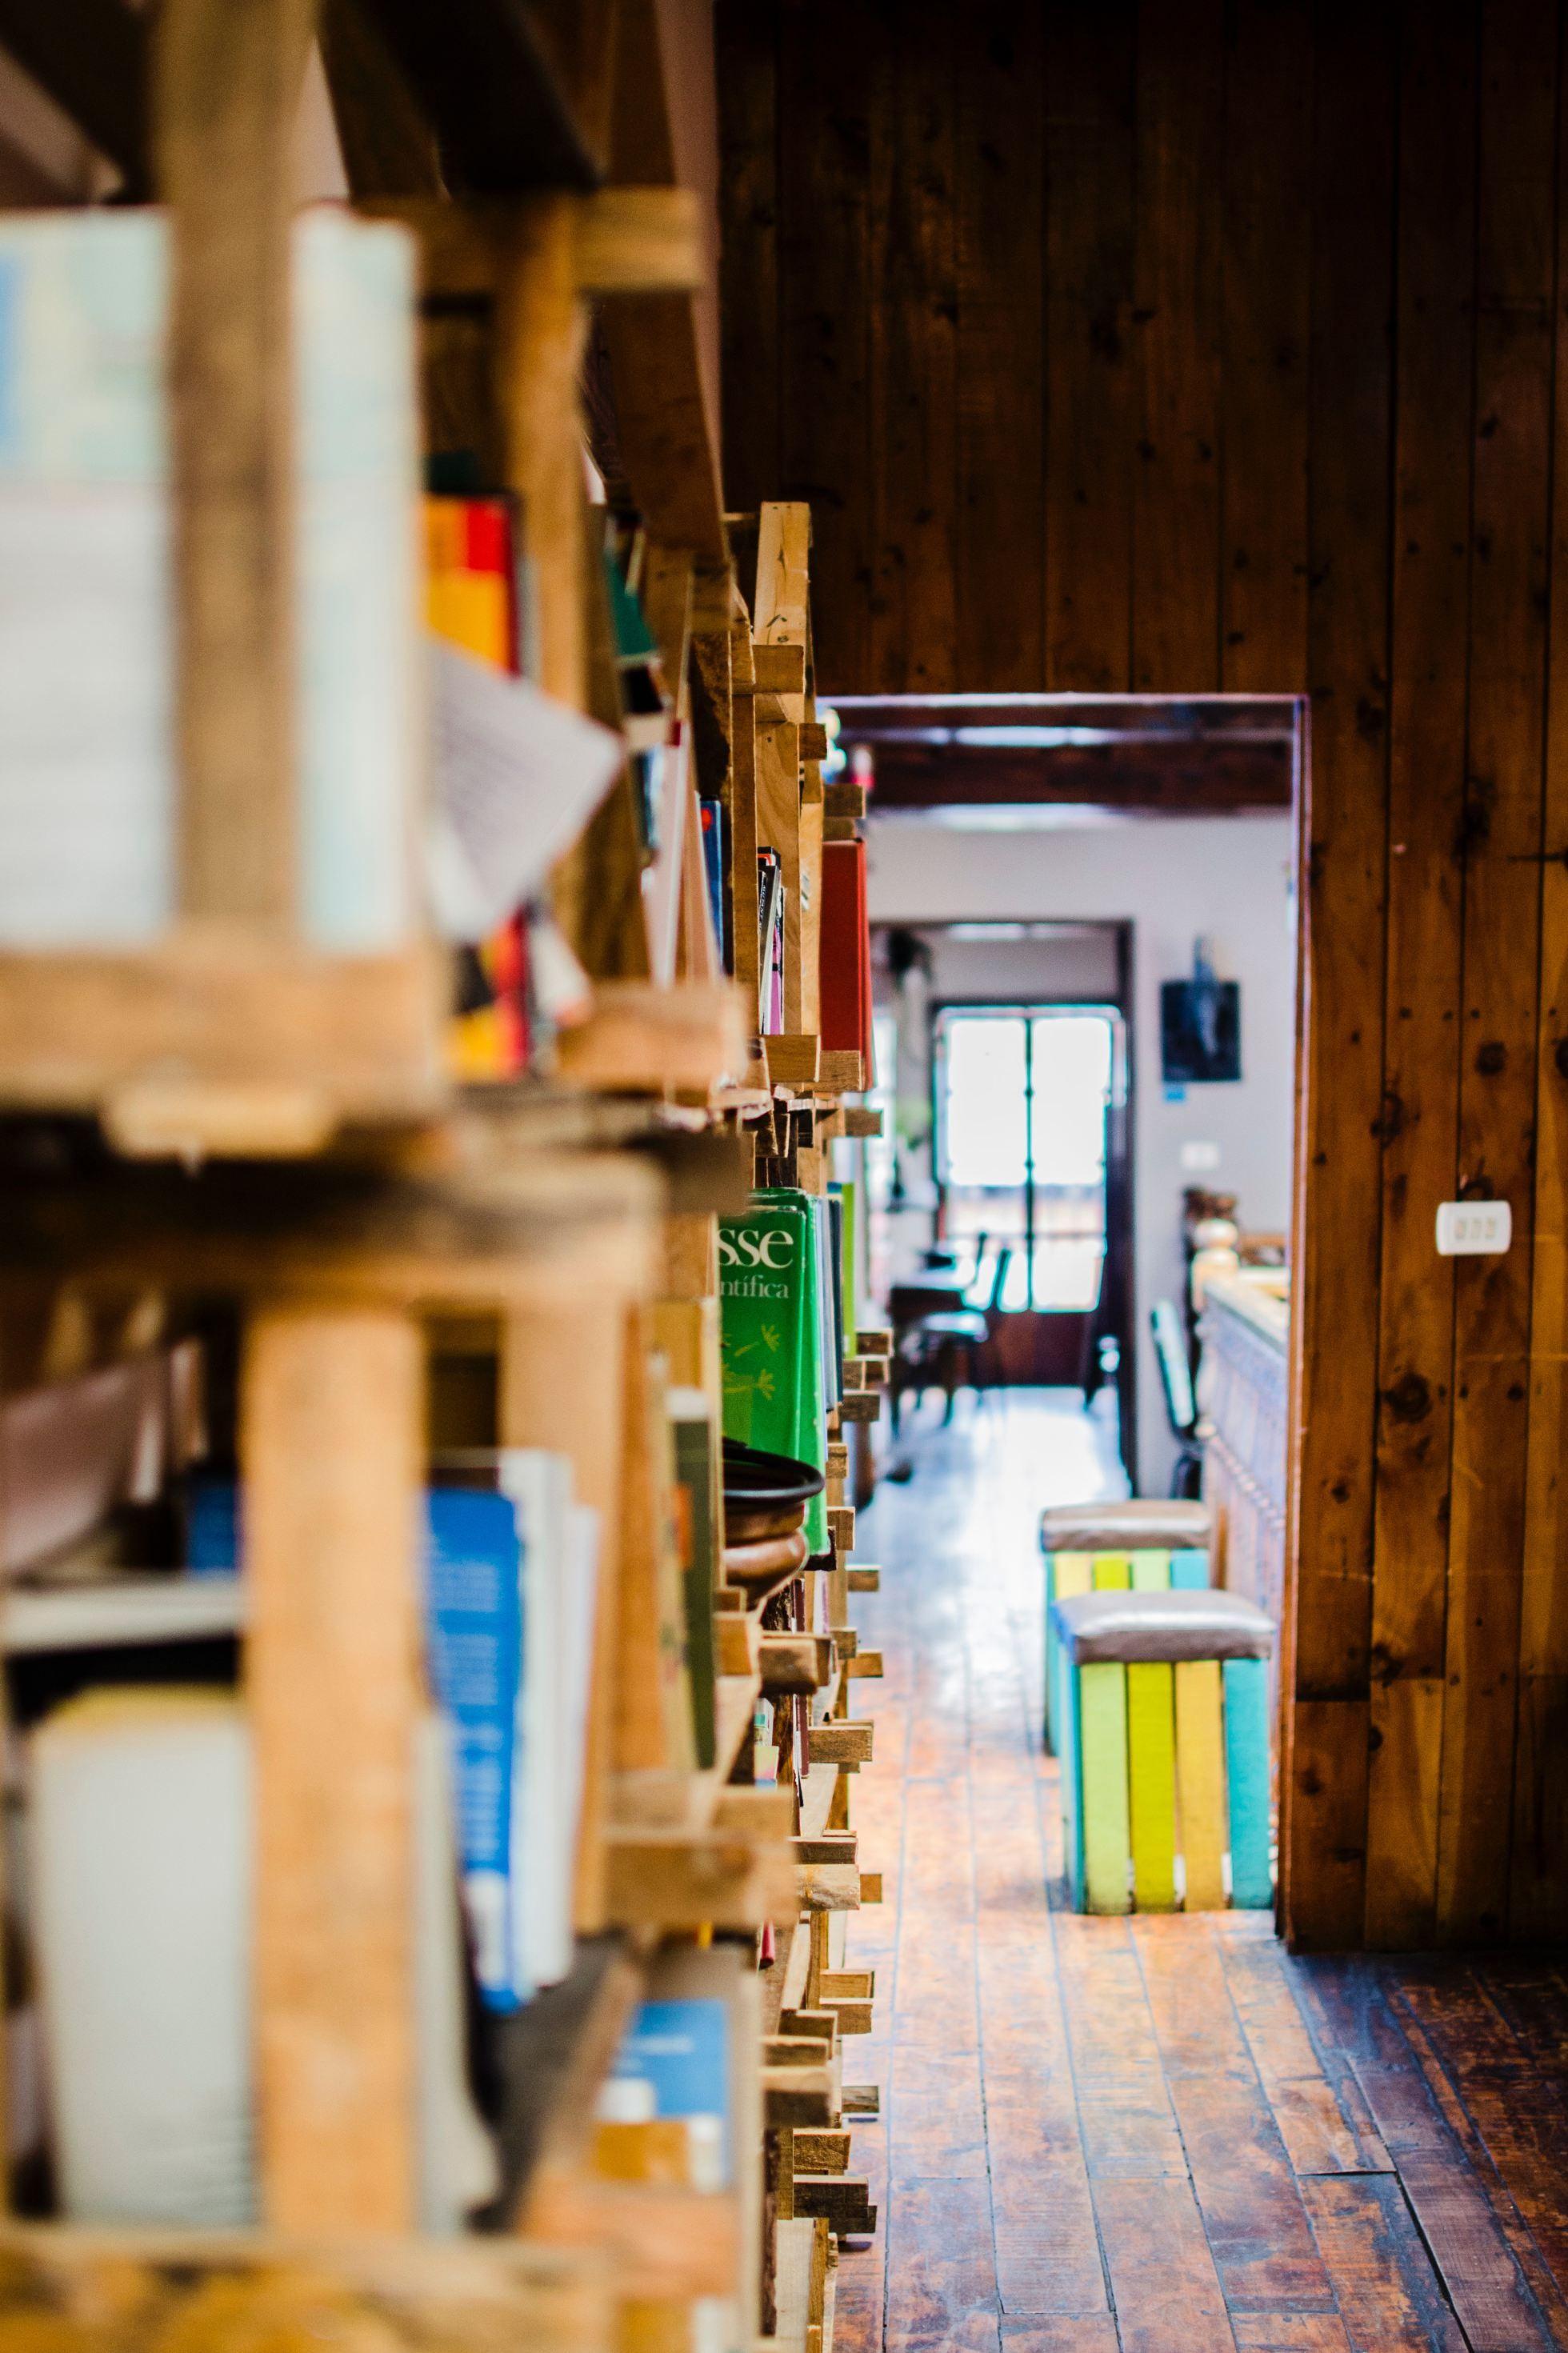 Bookshelf coffee shop opening a coffee shop starting a